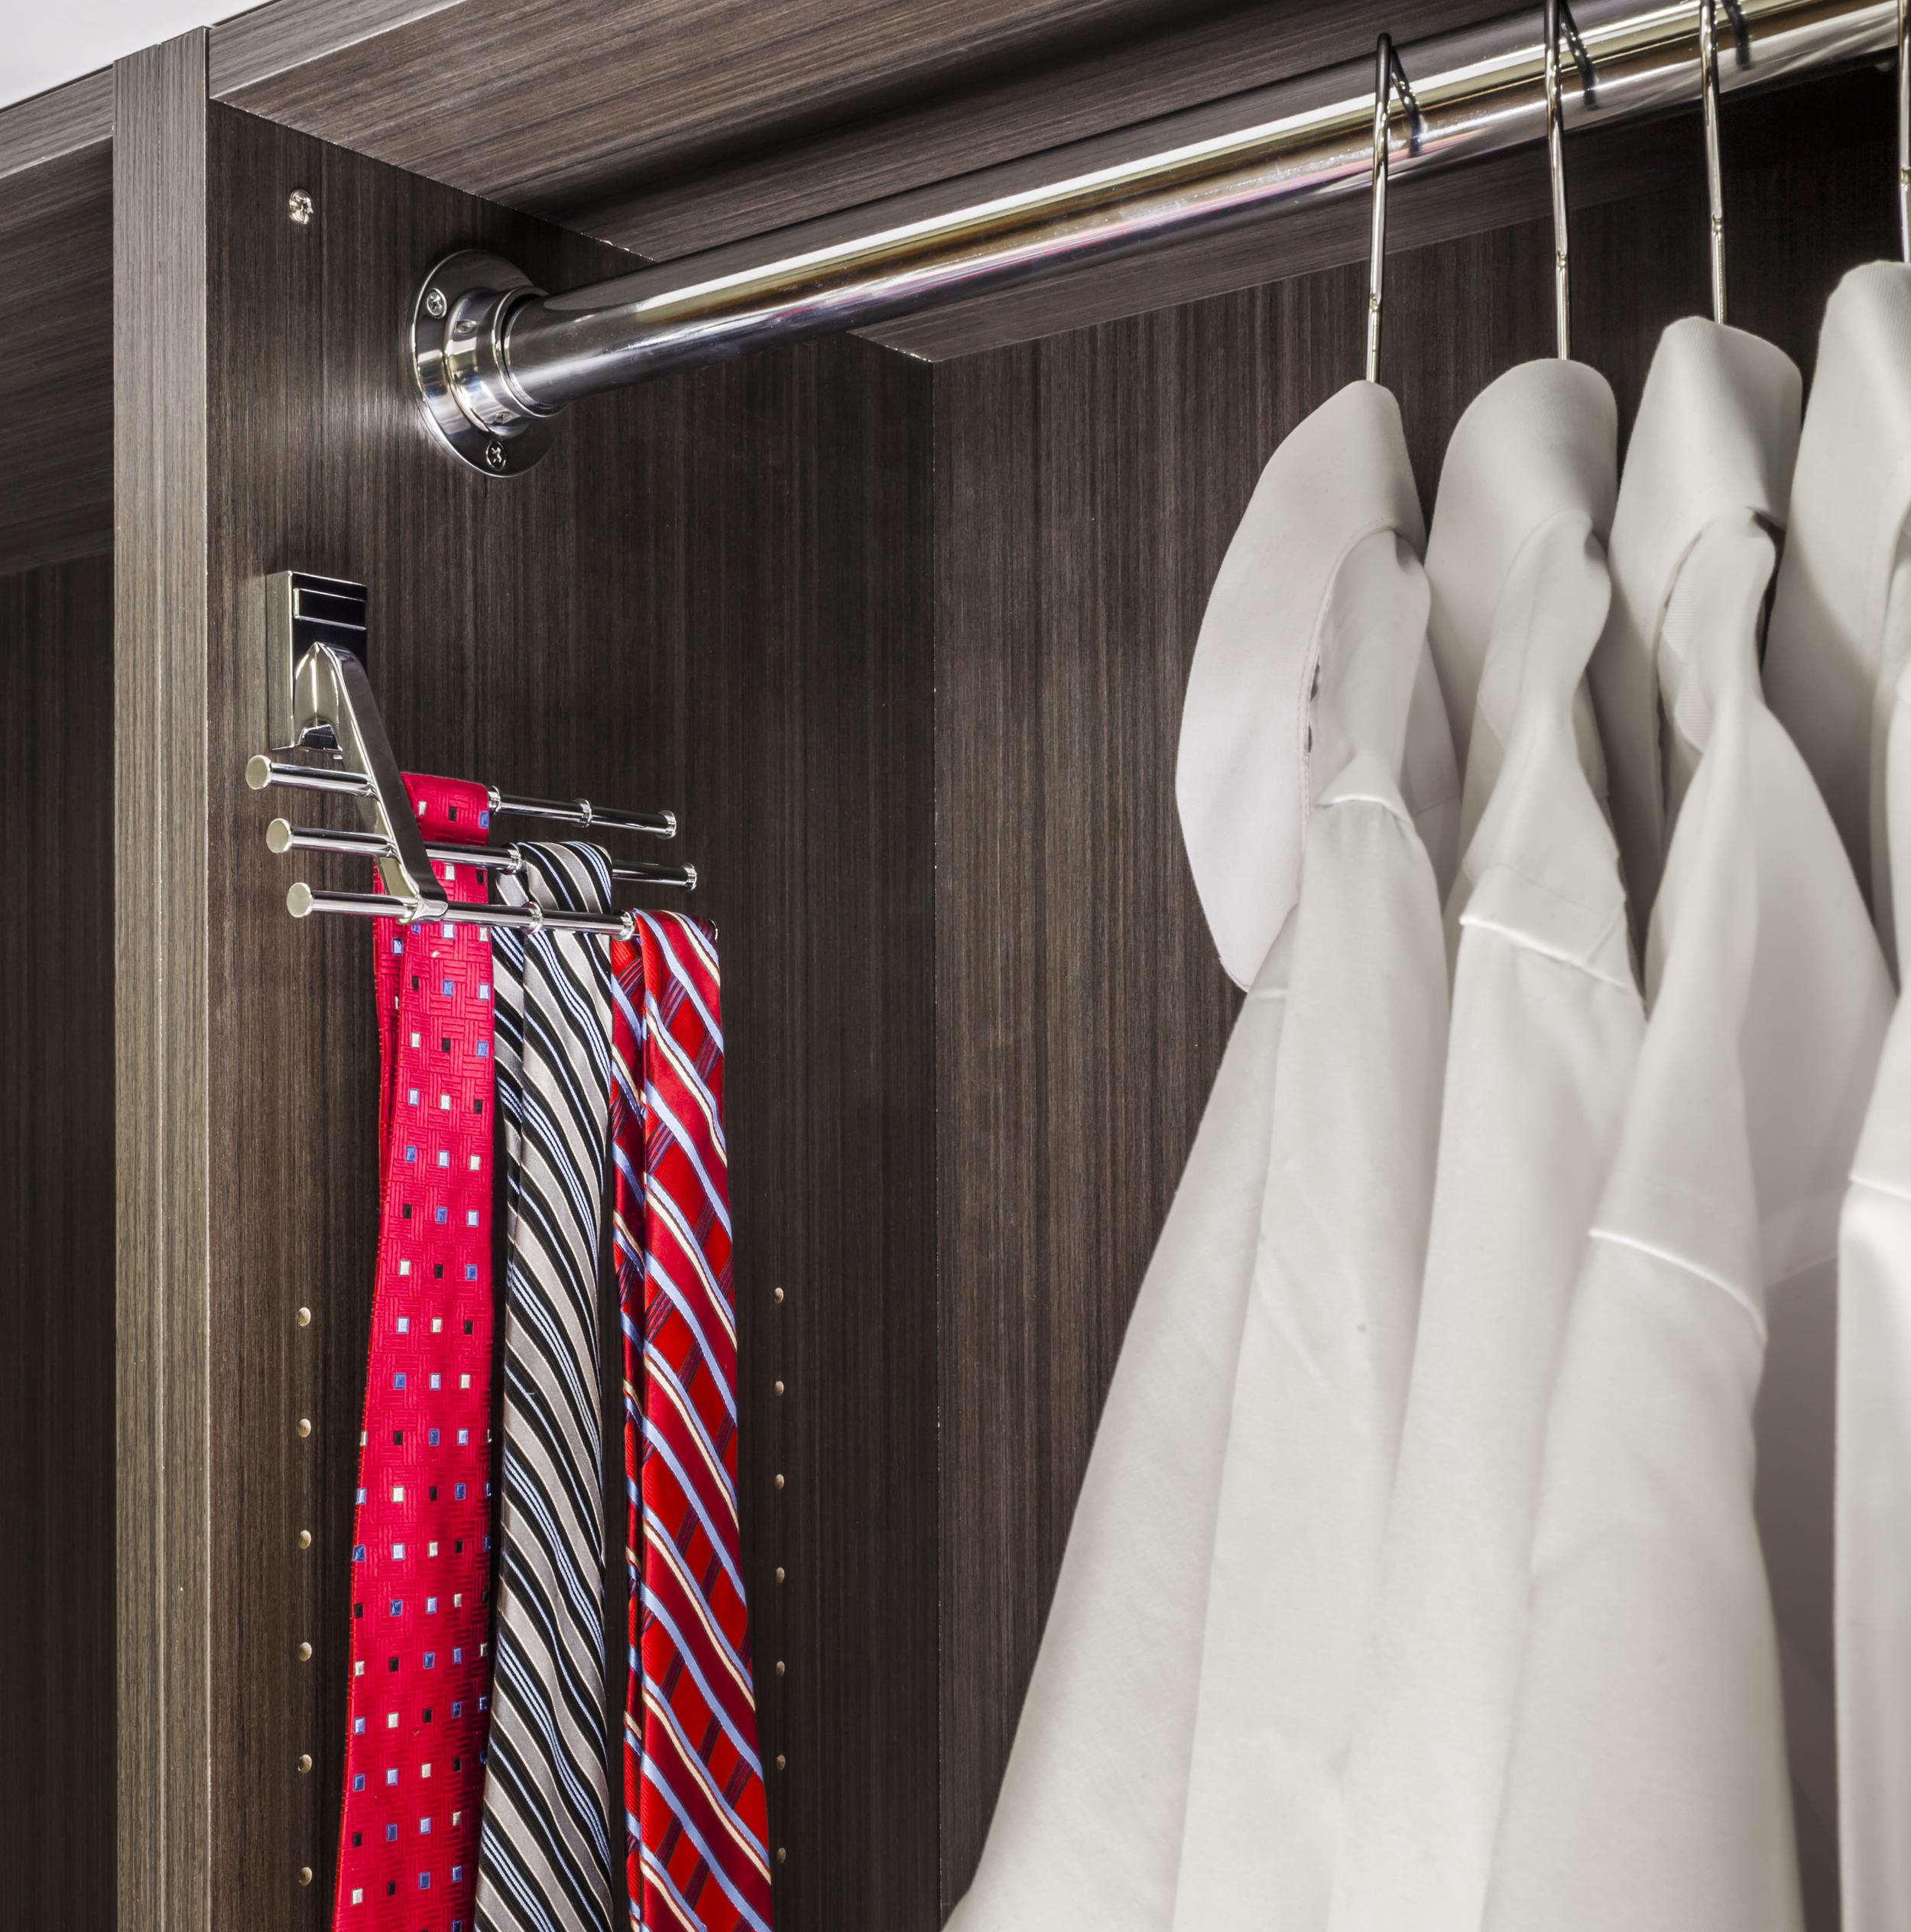 Tie & Scarf Rack, Courtesy Hardware Resources